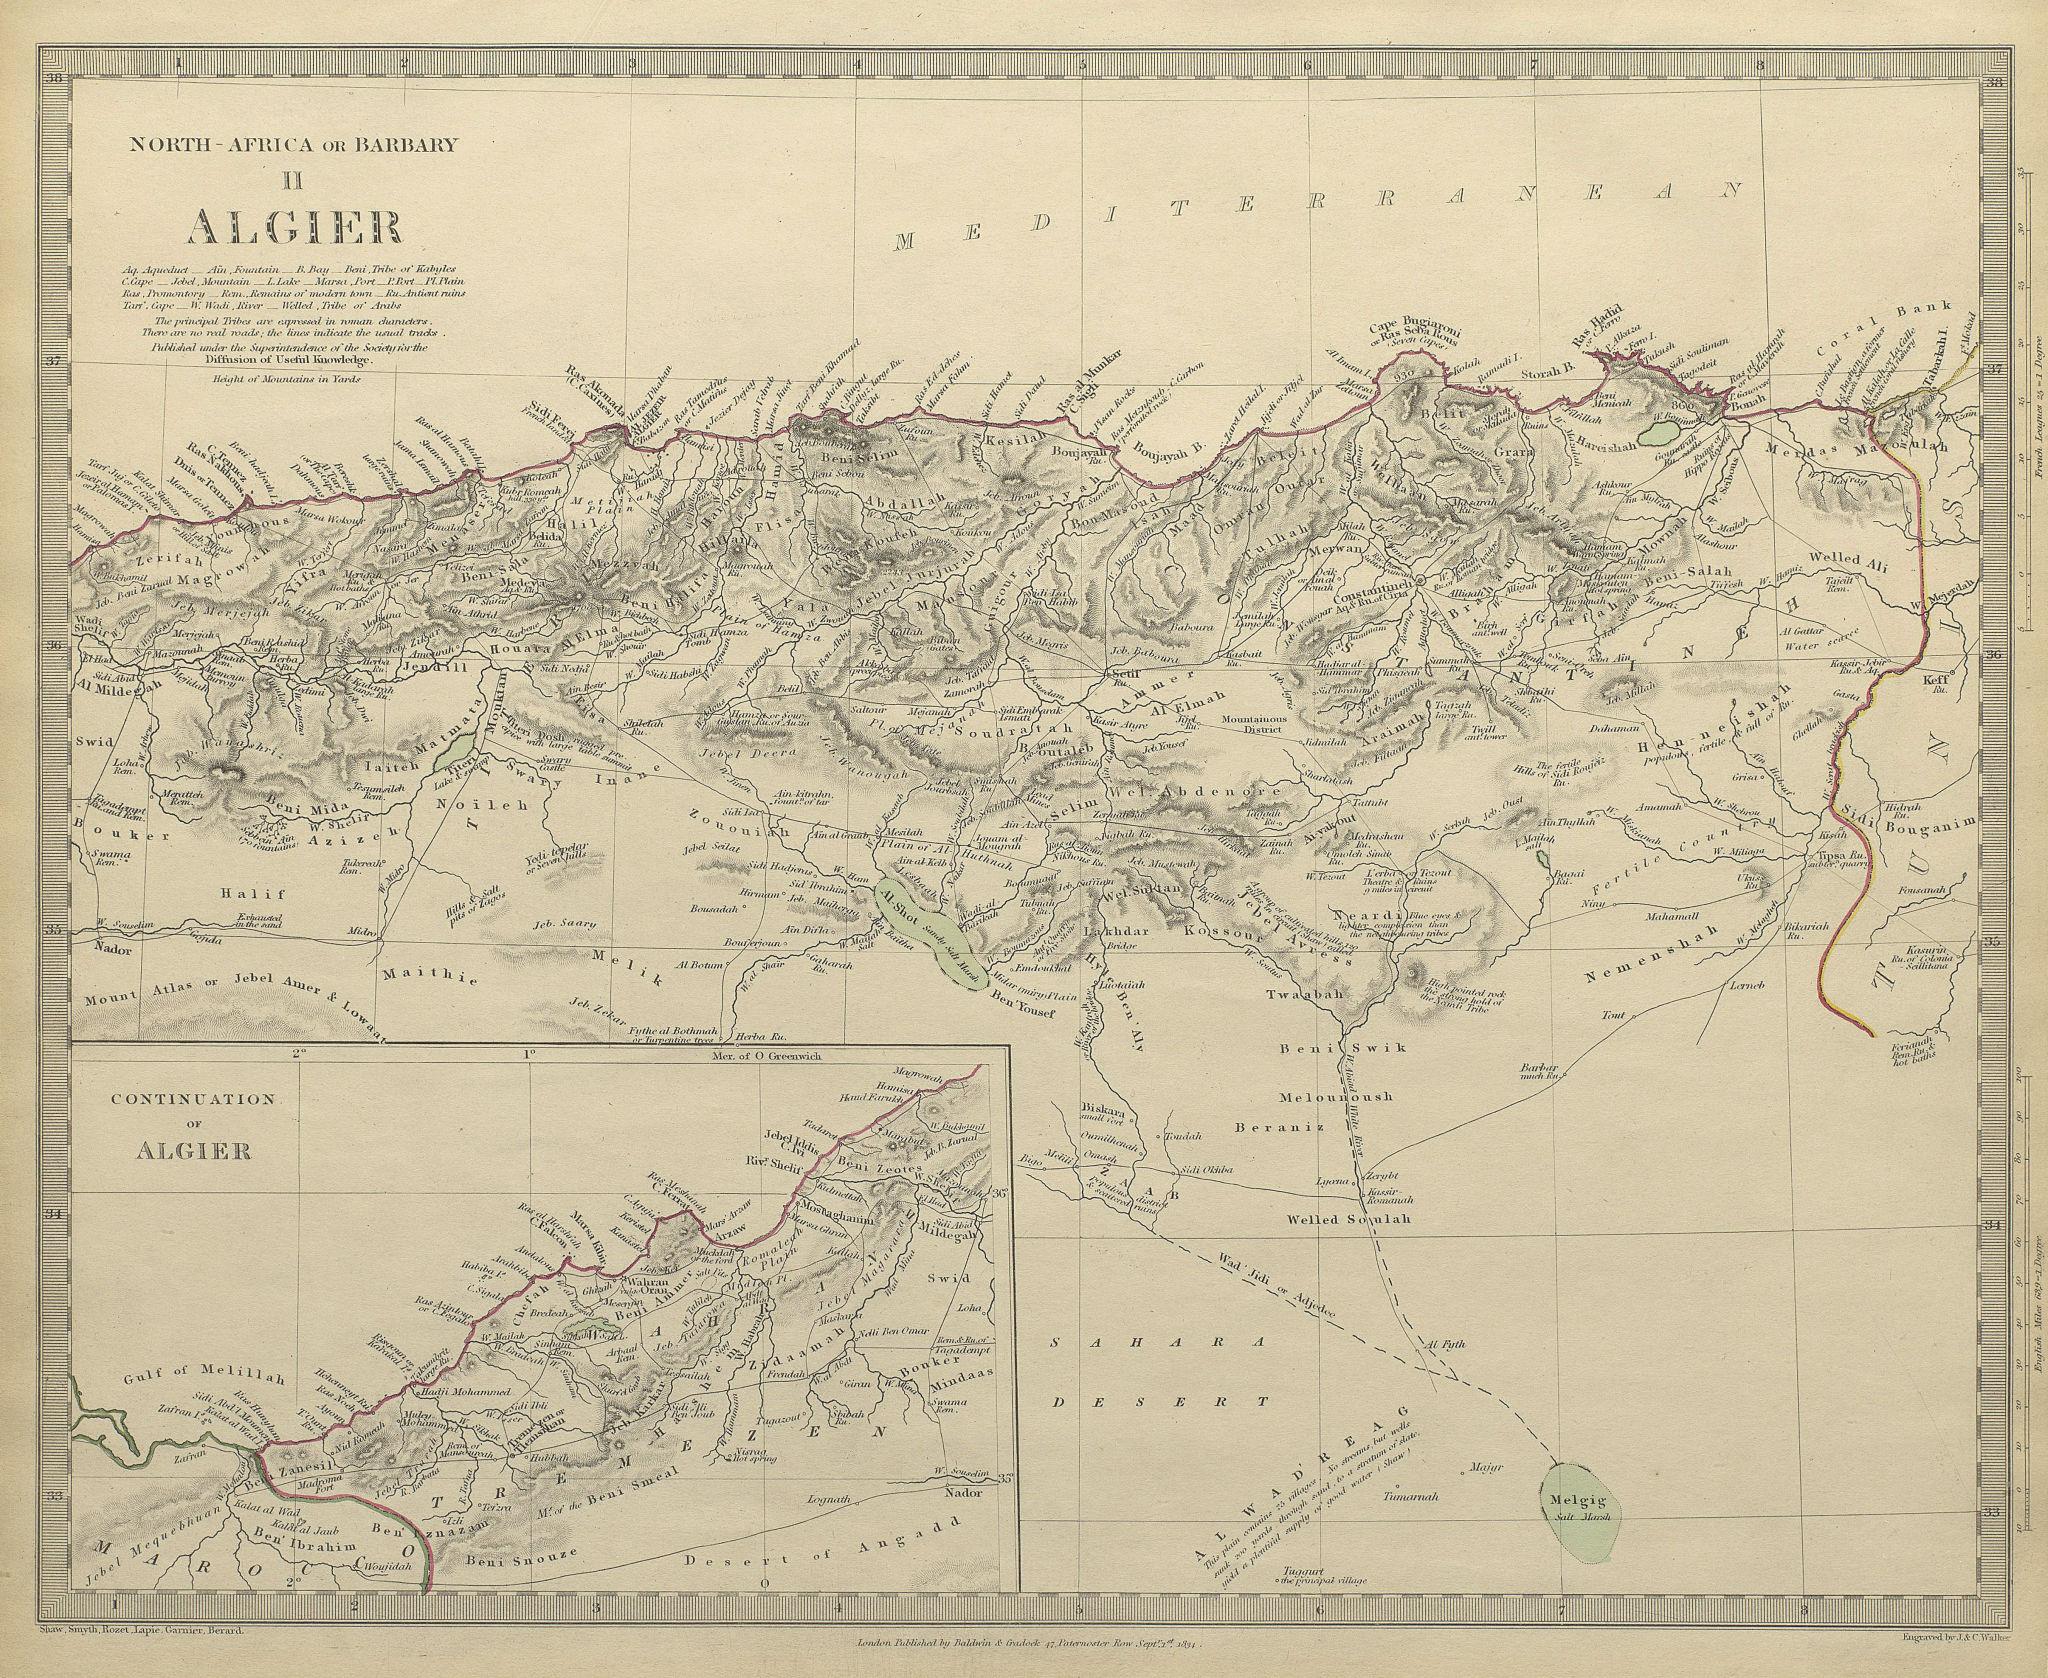 Associate Product ALGERIA. North Africa or Barbary. Algier Algiers. SDUK 1844 old antique map